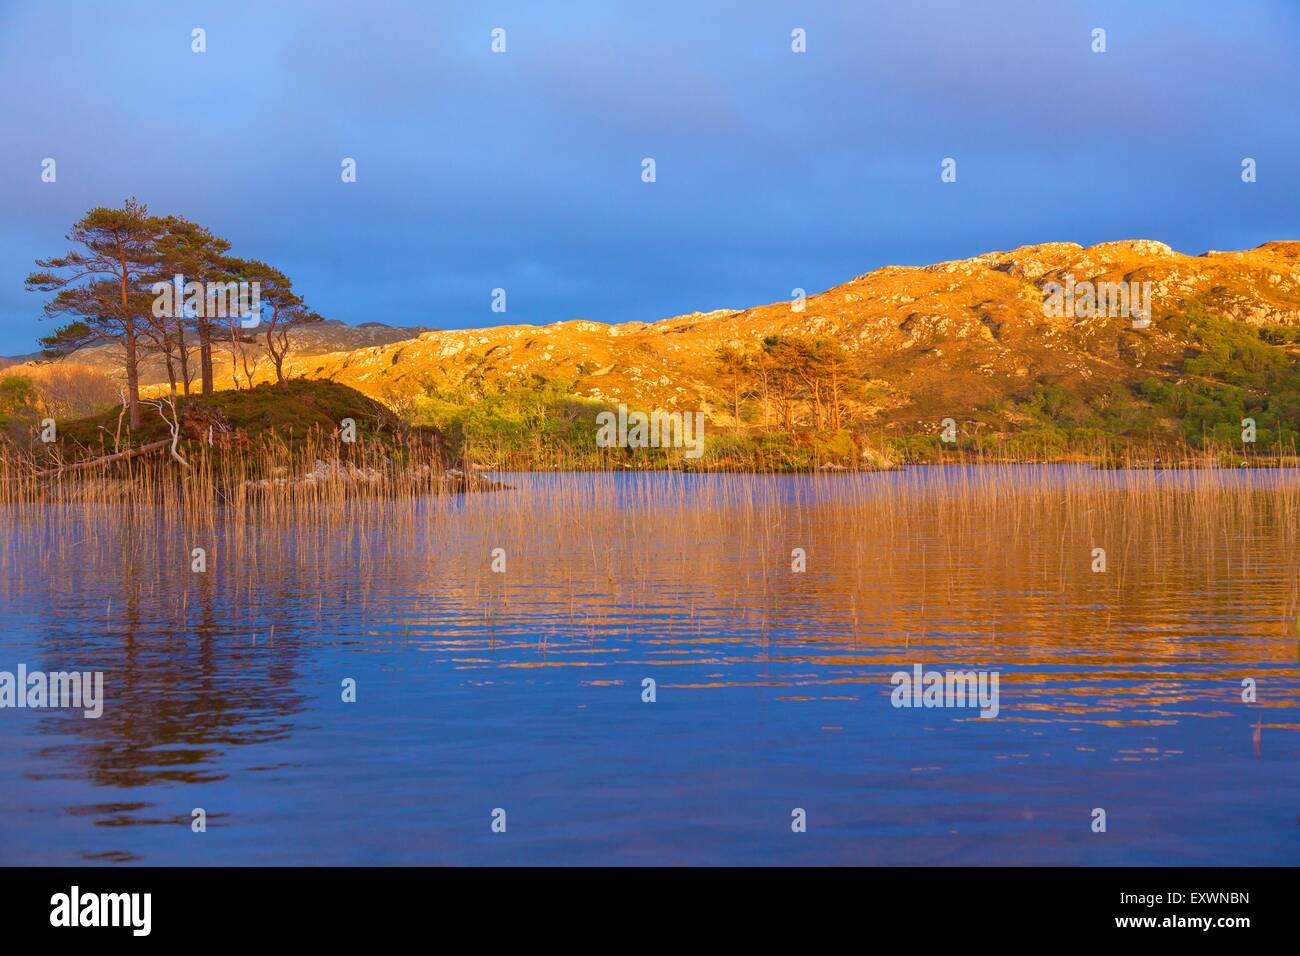 Loch Druim Suardalain, Assynt, Scotland, Great Britain, Europe Stock Photo